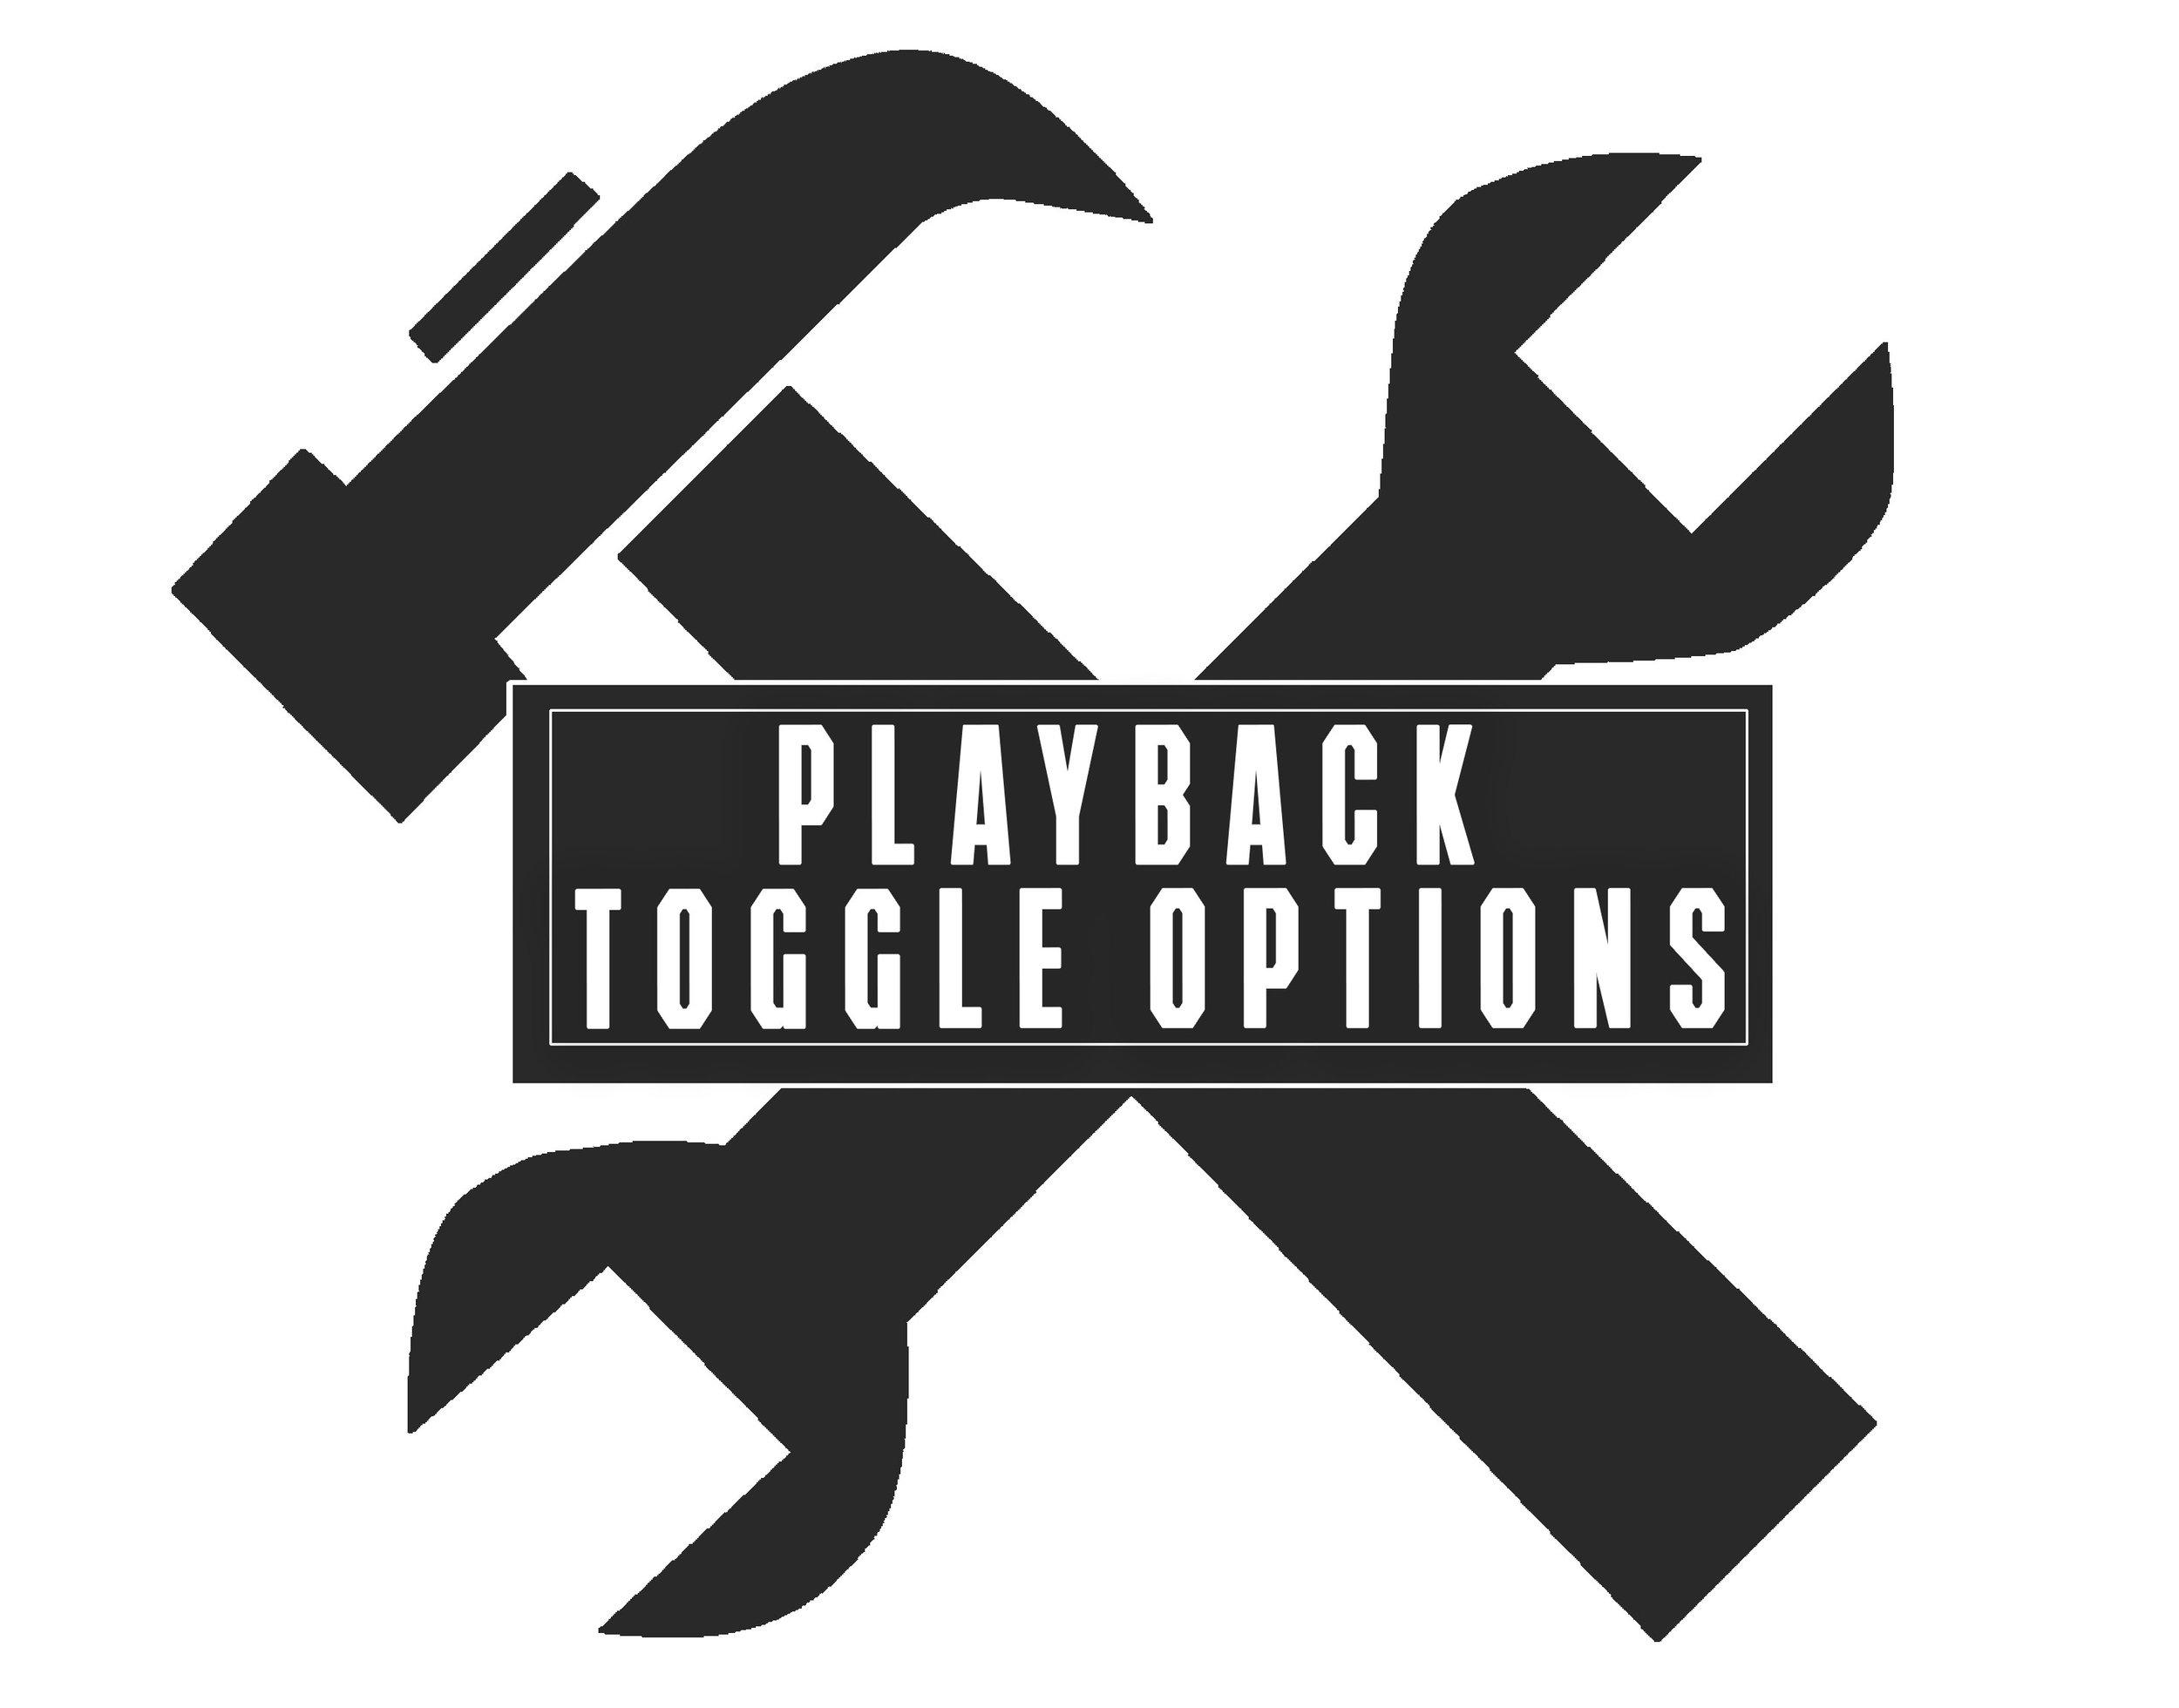 PlaybackToggleOptions.jpg